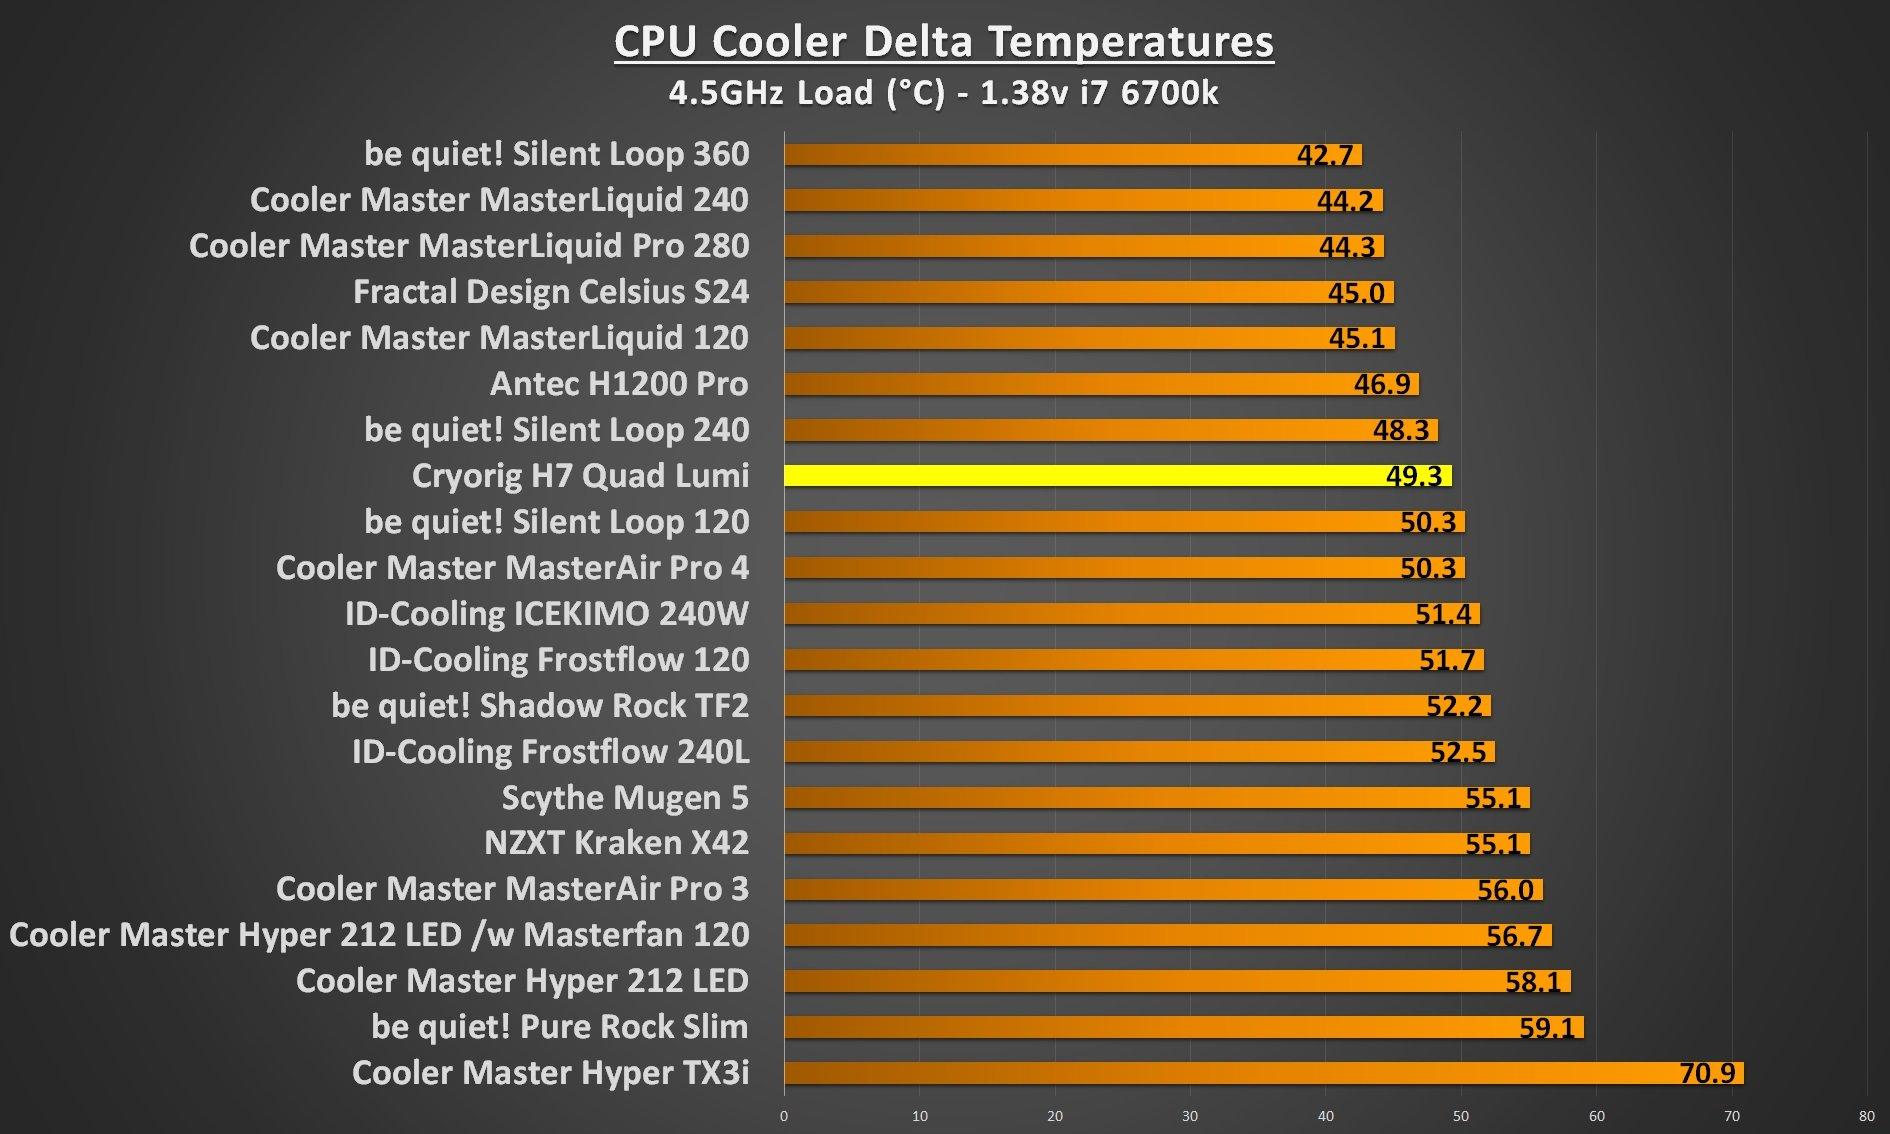 Cryorig H7 Quad Lumi 4.5Ghz load